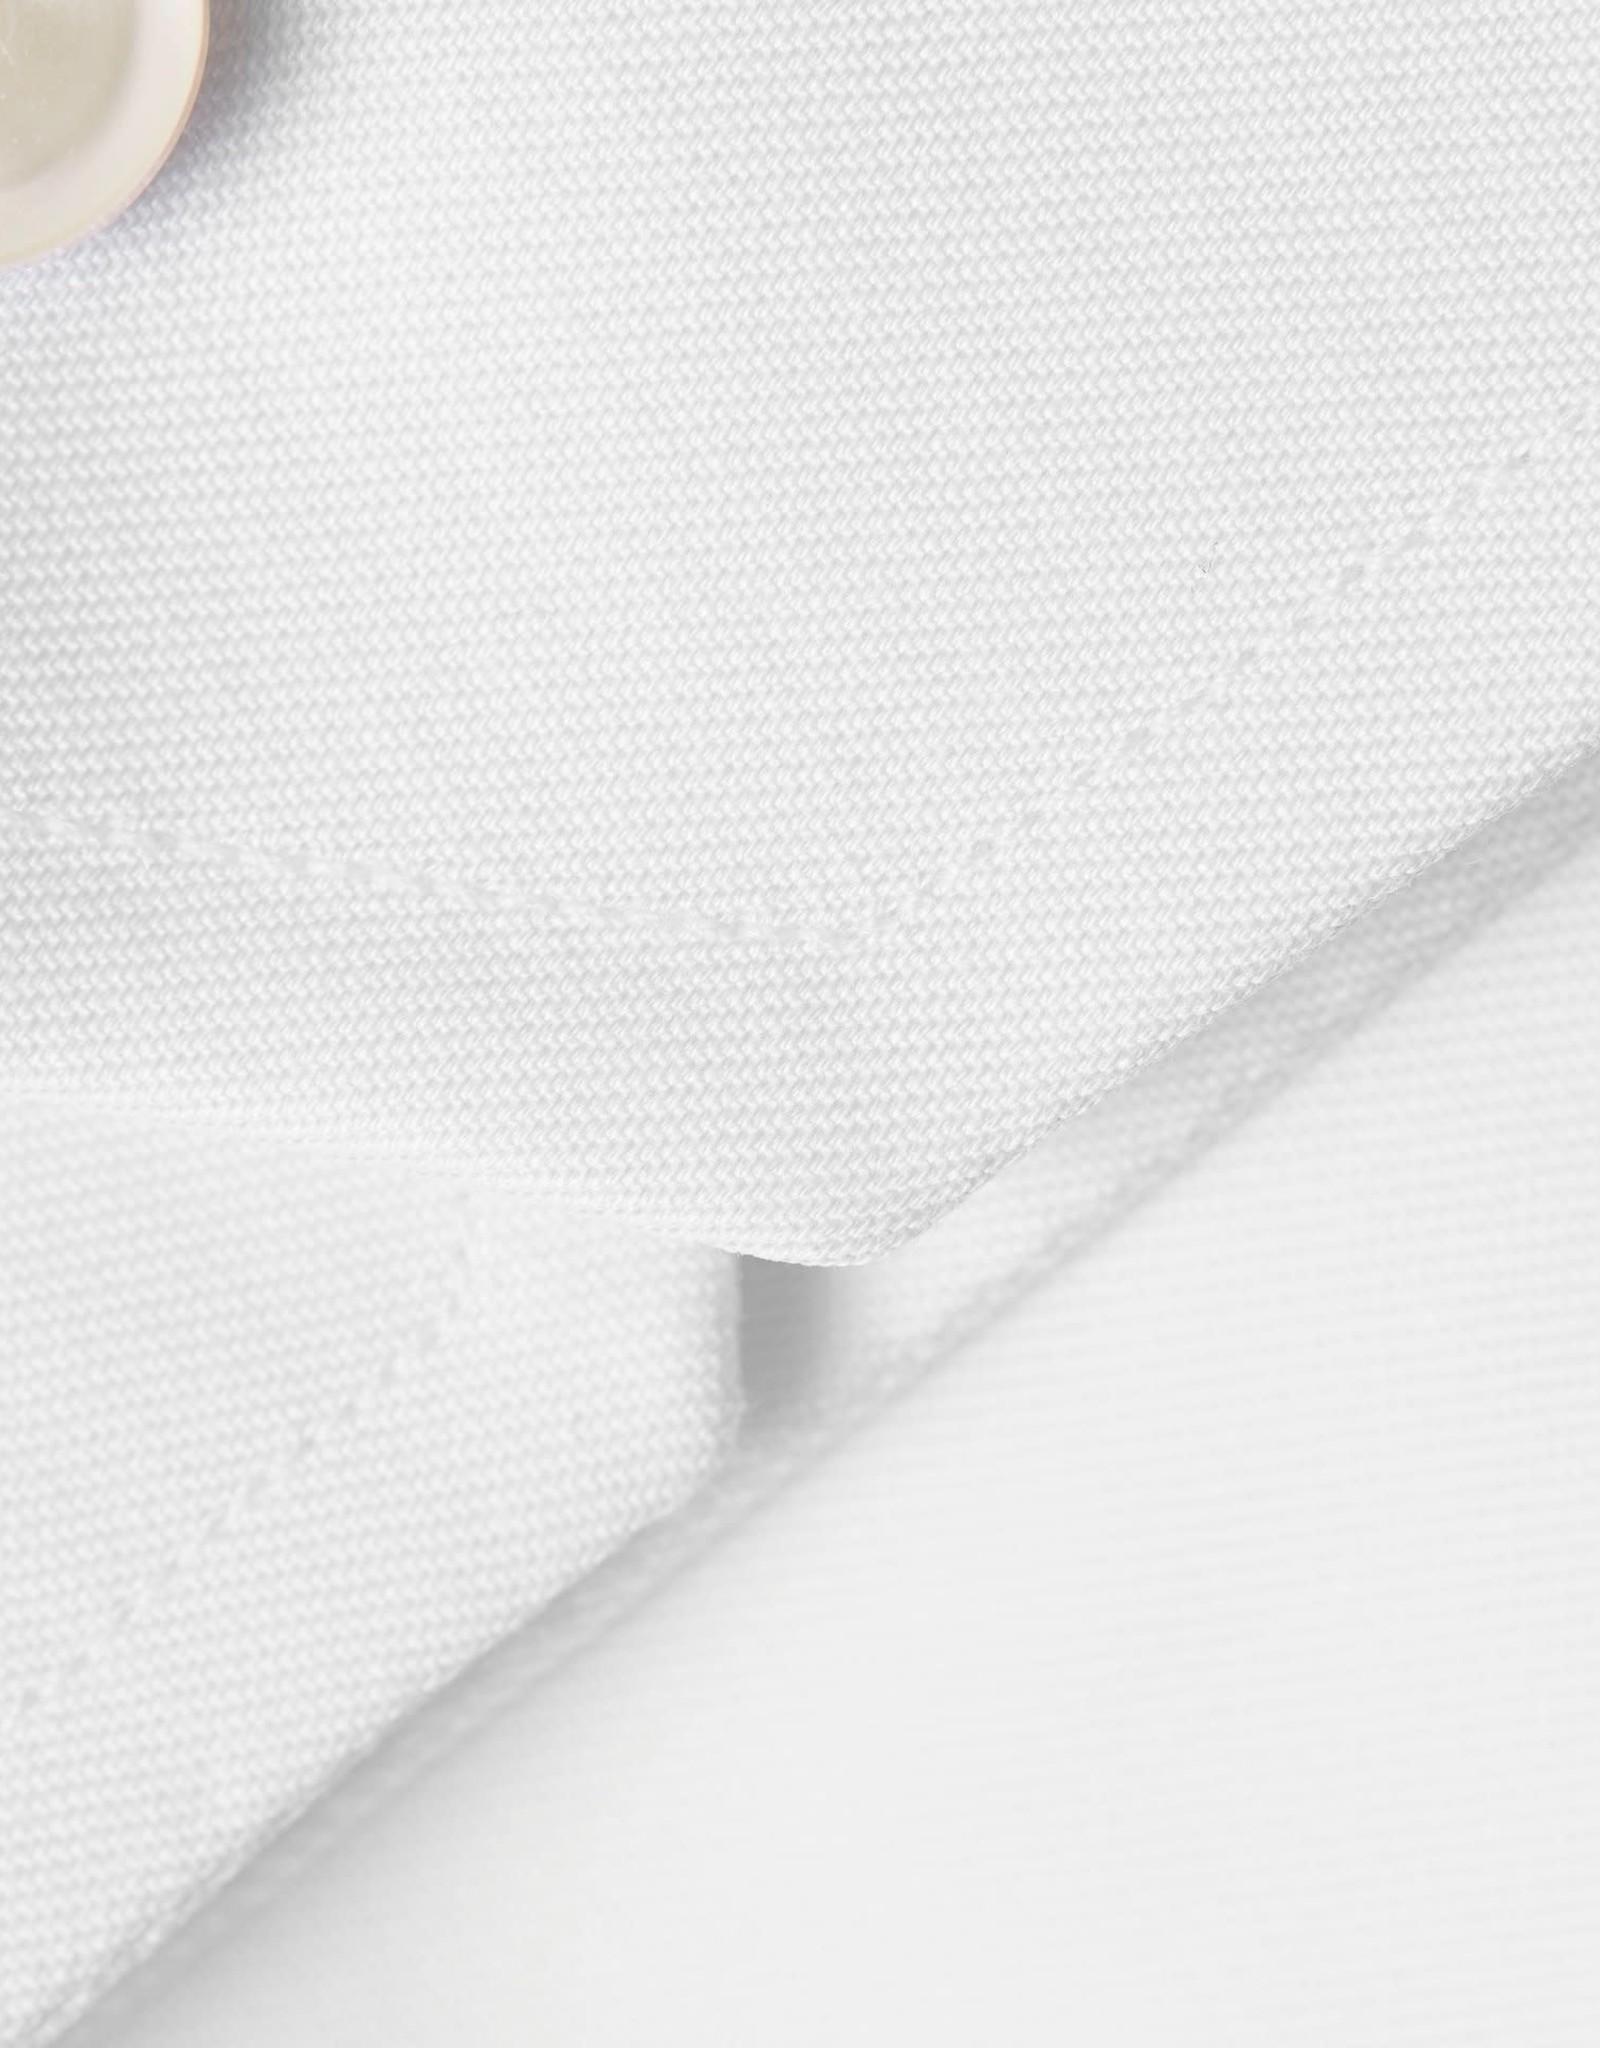 Eton Eton hemd wit contemporary 3000-79311